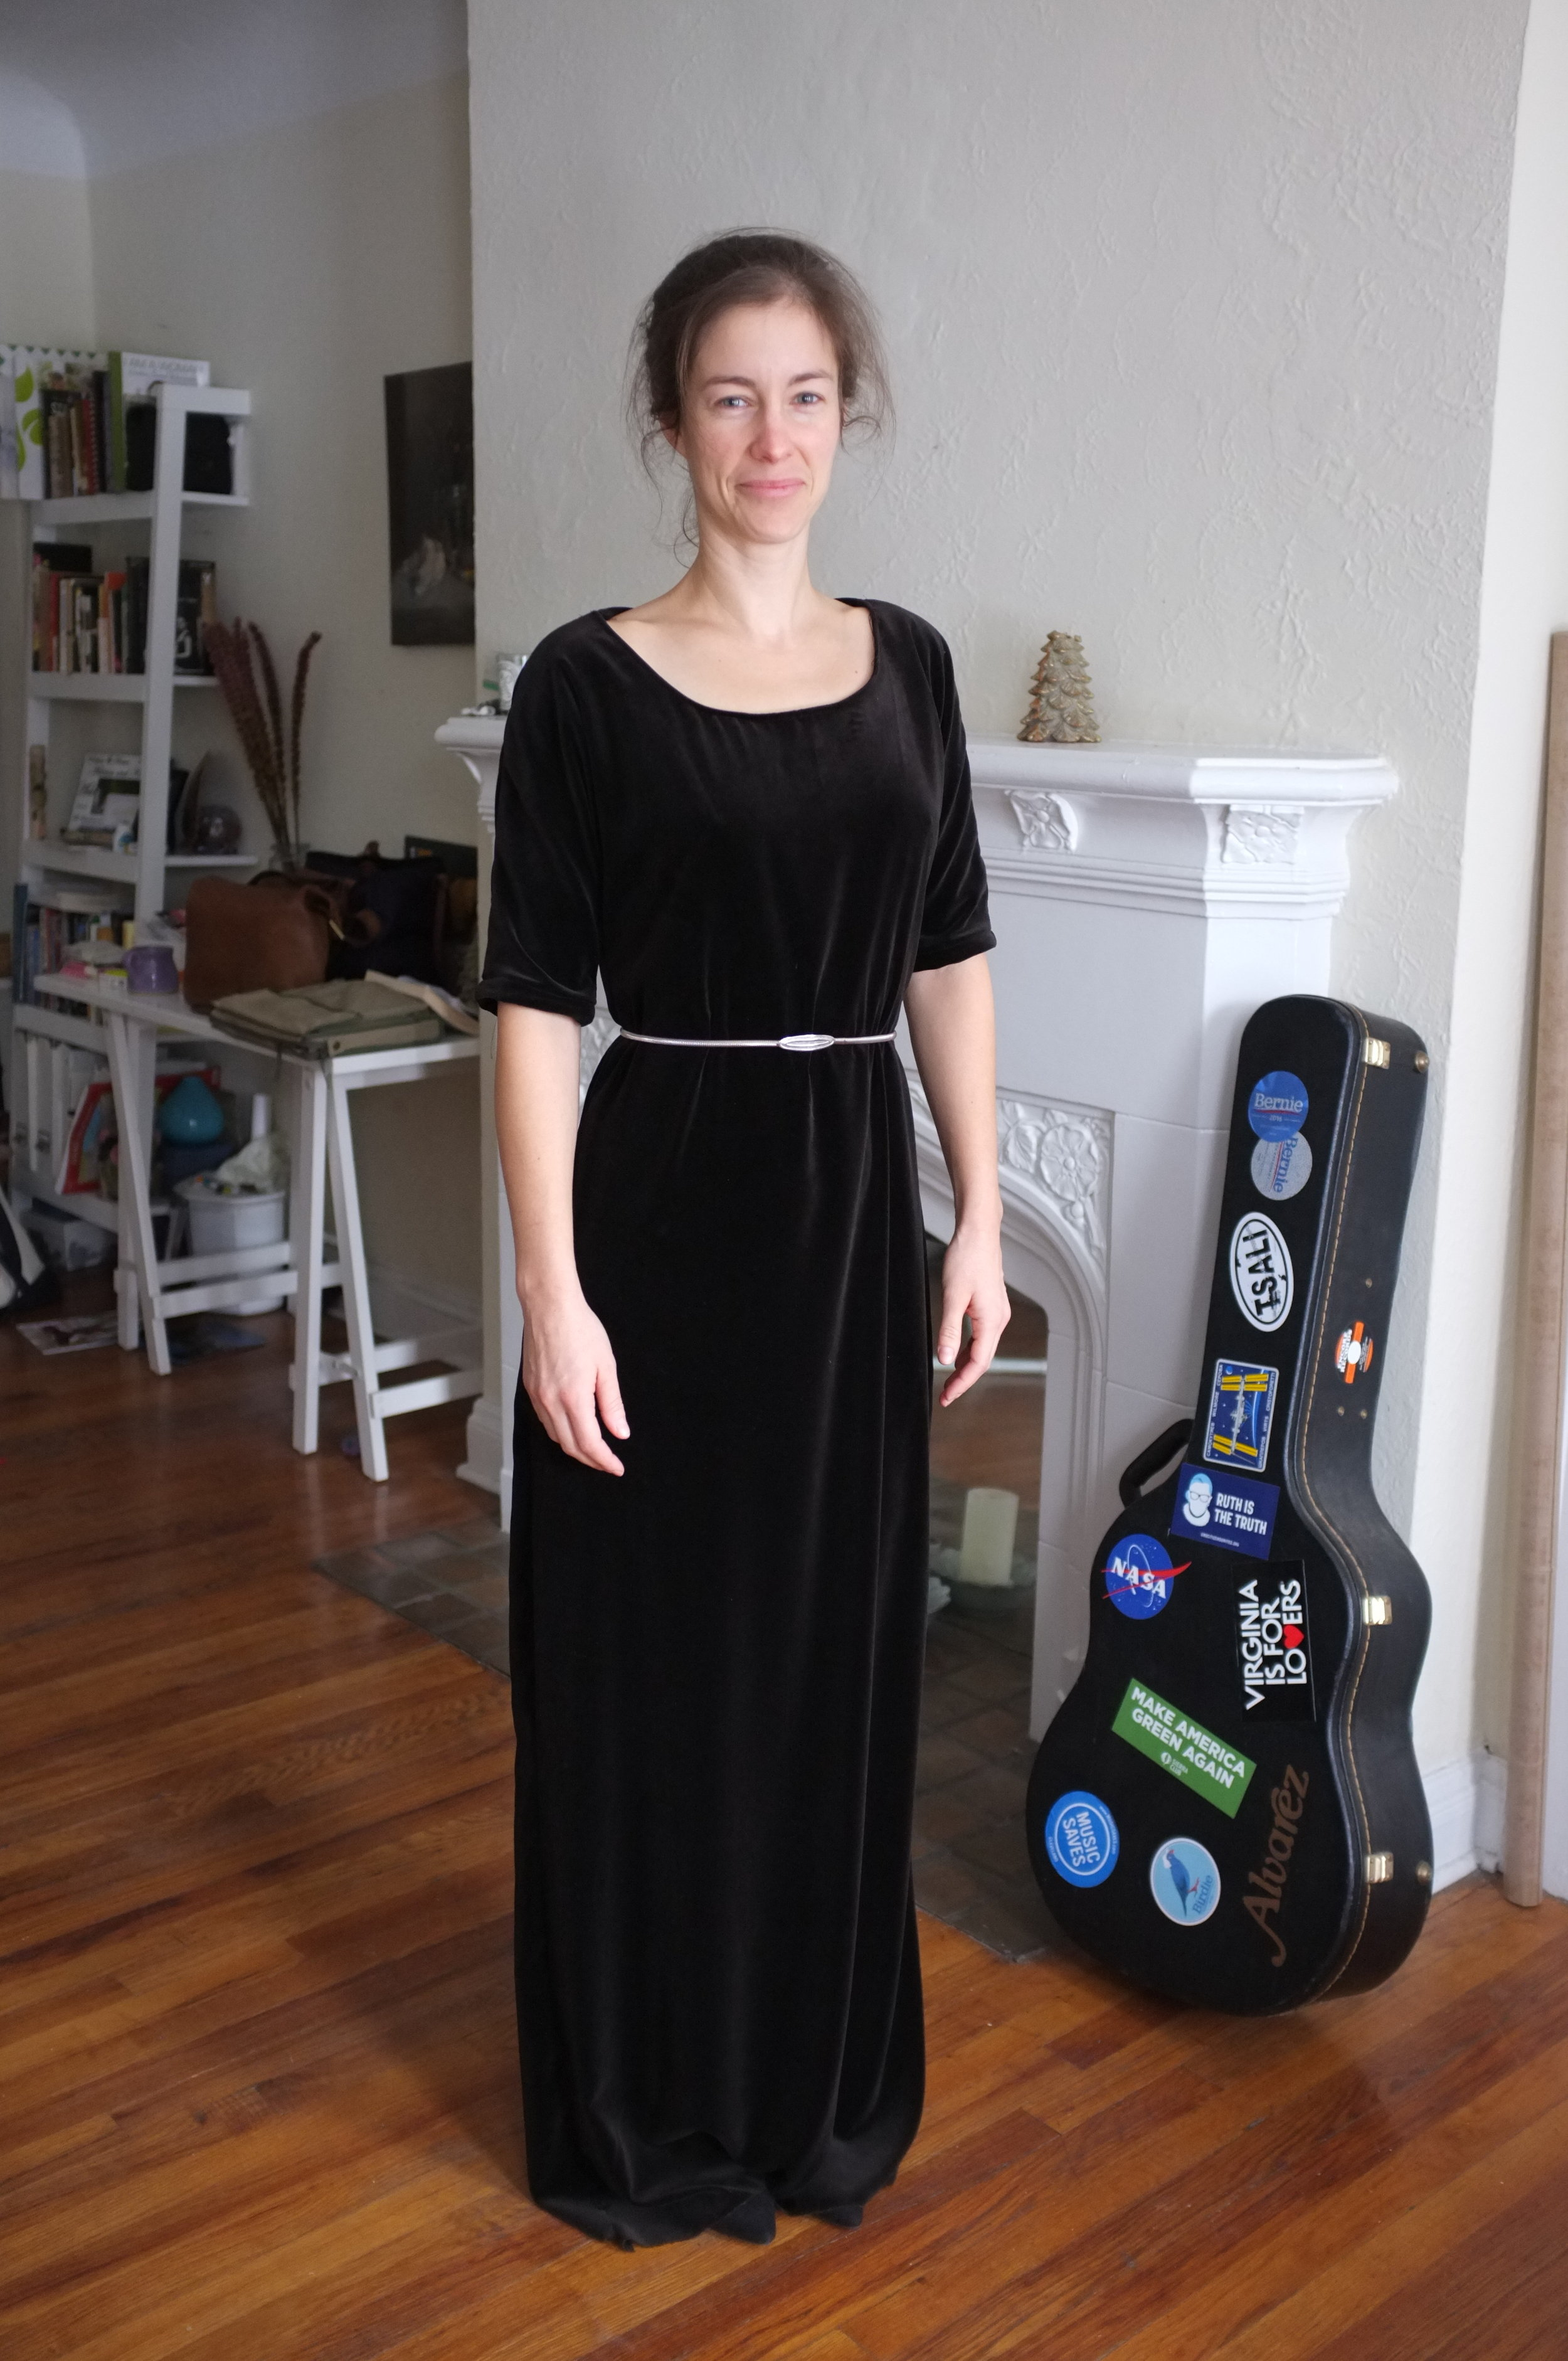 The dress Kristina made for the event